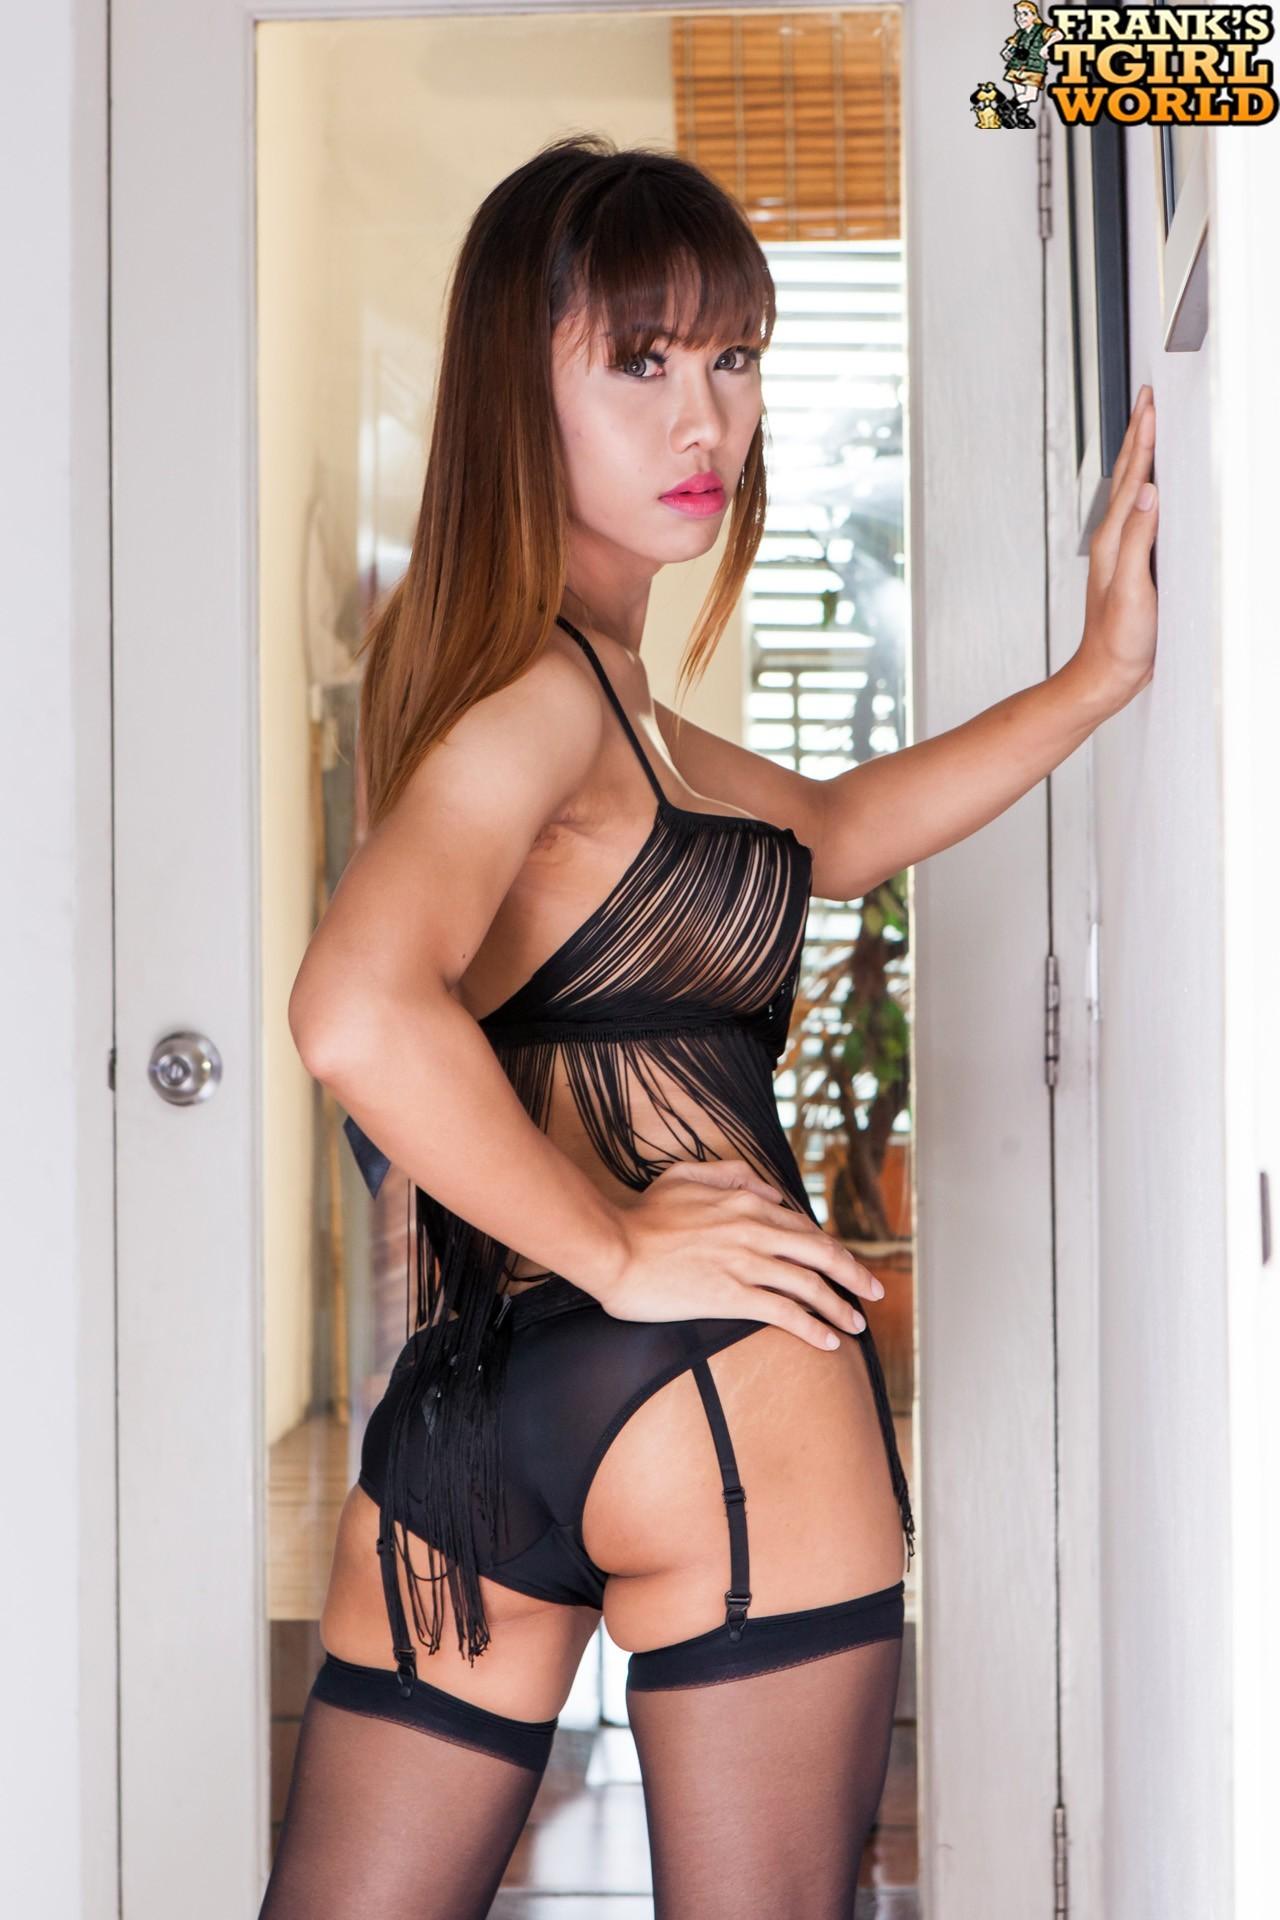 Ts Rita Is A Nice Bangkok Transgirl With A Steamy Smooth